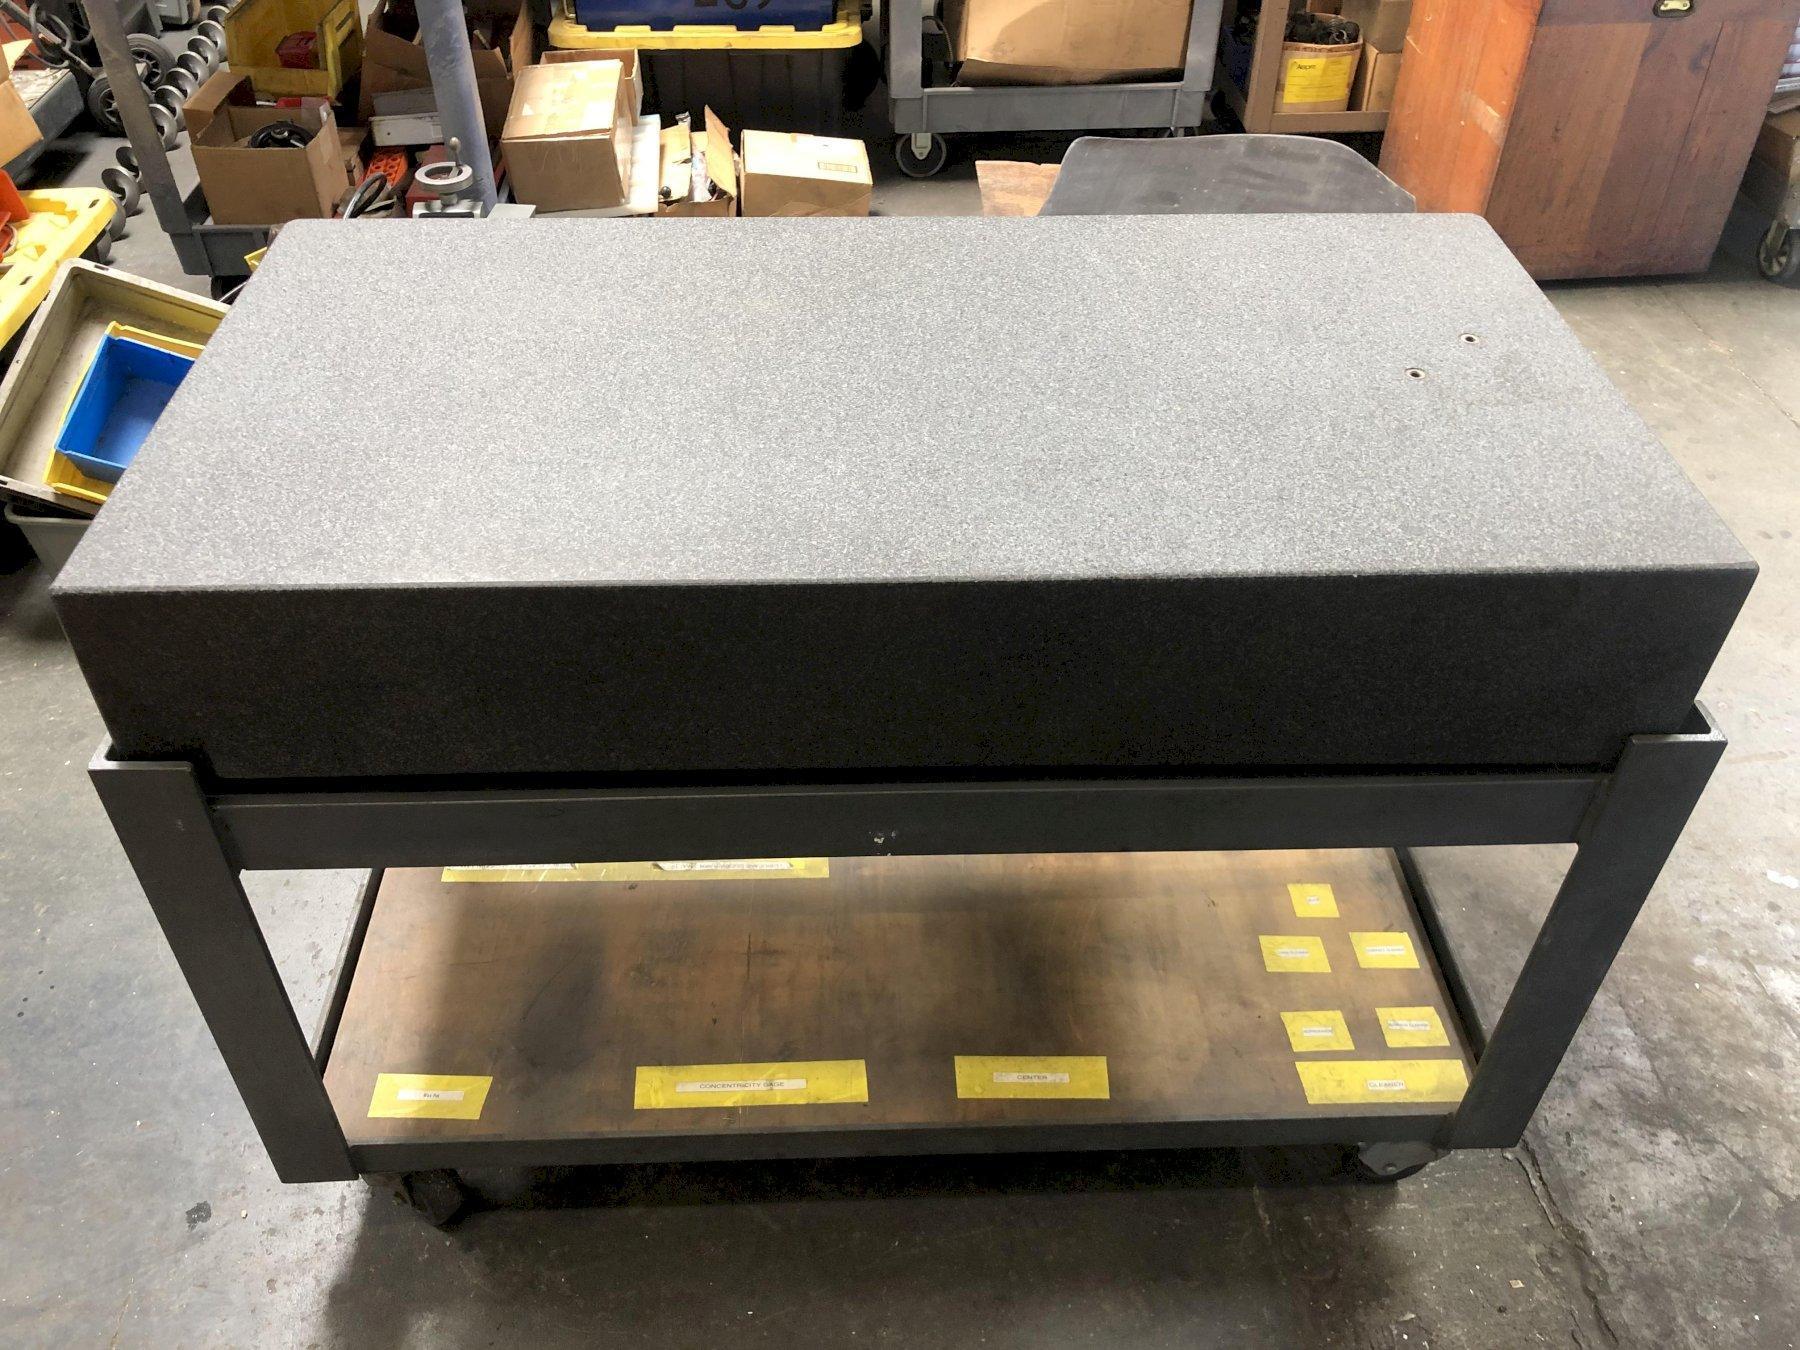 "Standridge Granite Surface Plate 47-5/8"" x 23-7/8"" x 7-5/8"" with: Stand, Grade B."